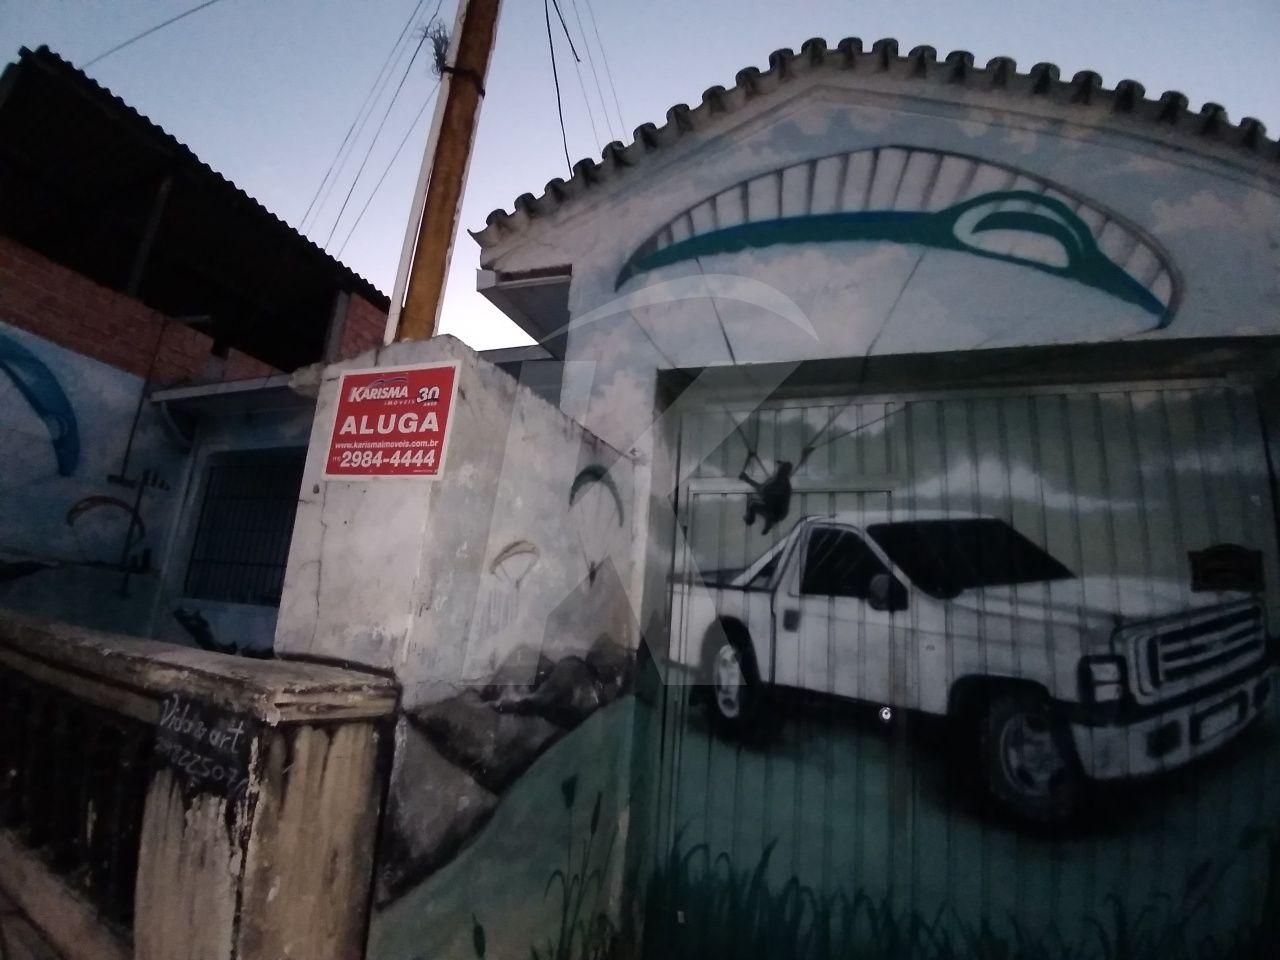 Alugar - Casa  - Vila Paiva - 2 dormitórios.